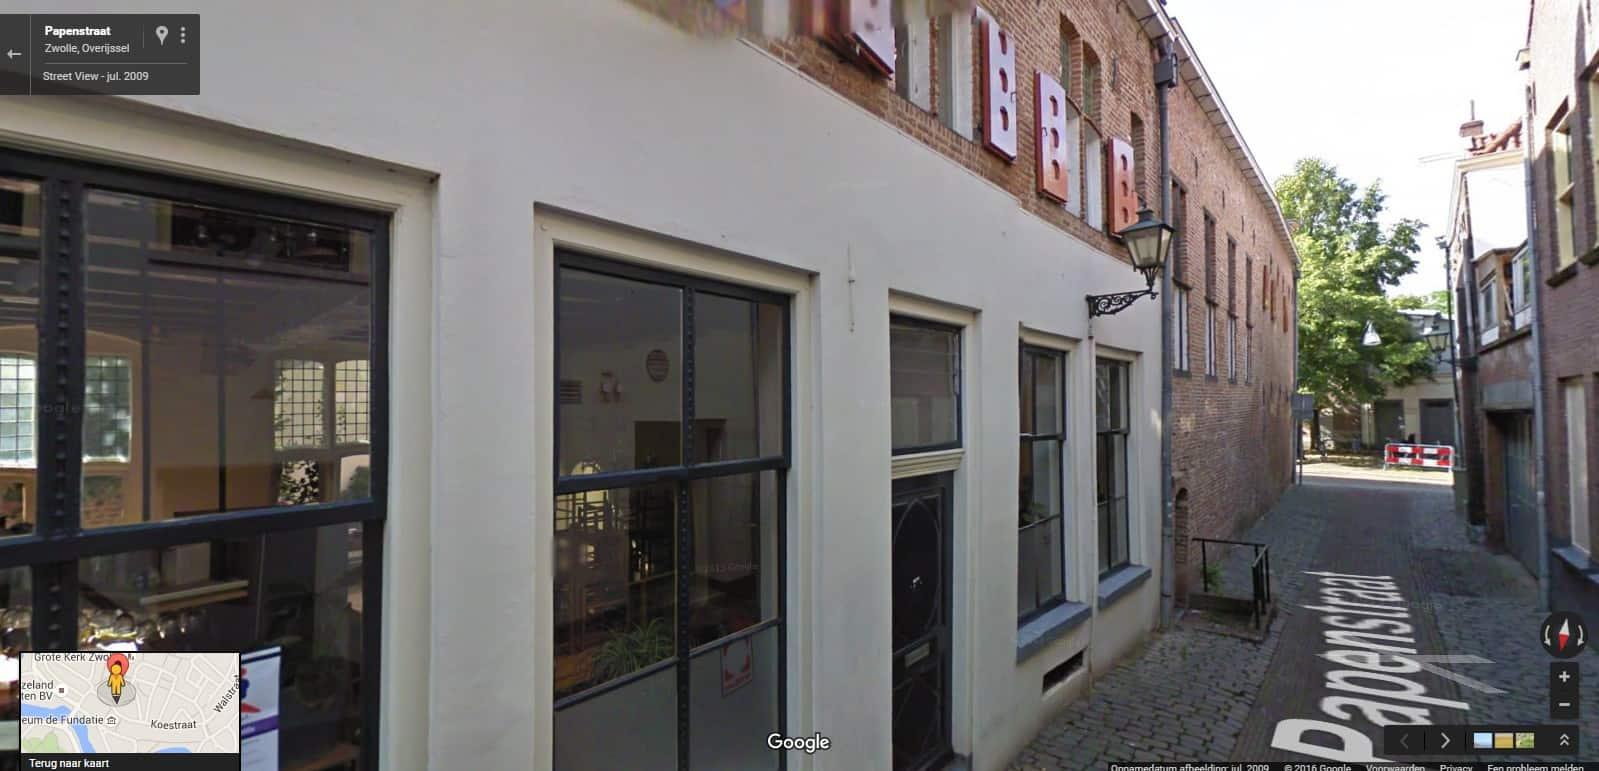 Papenstraat-9-14-Zwolle